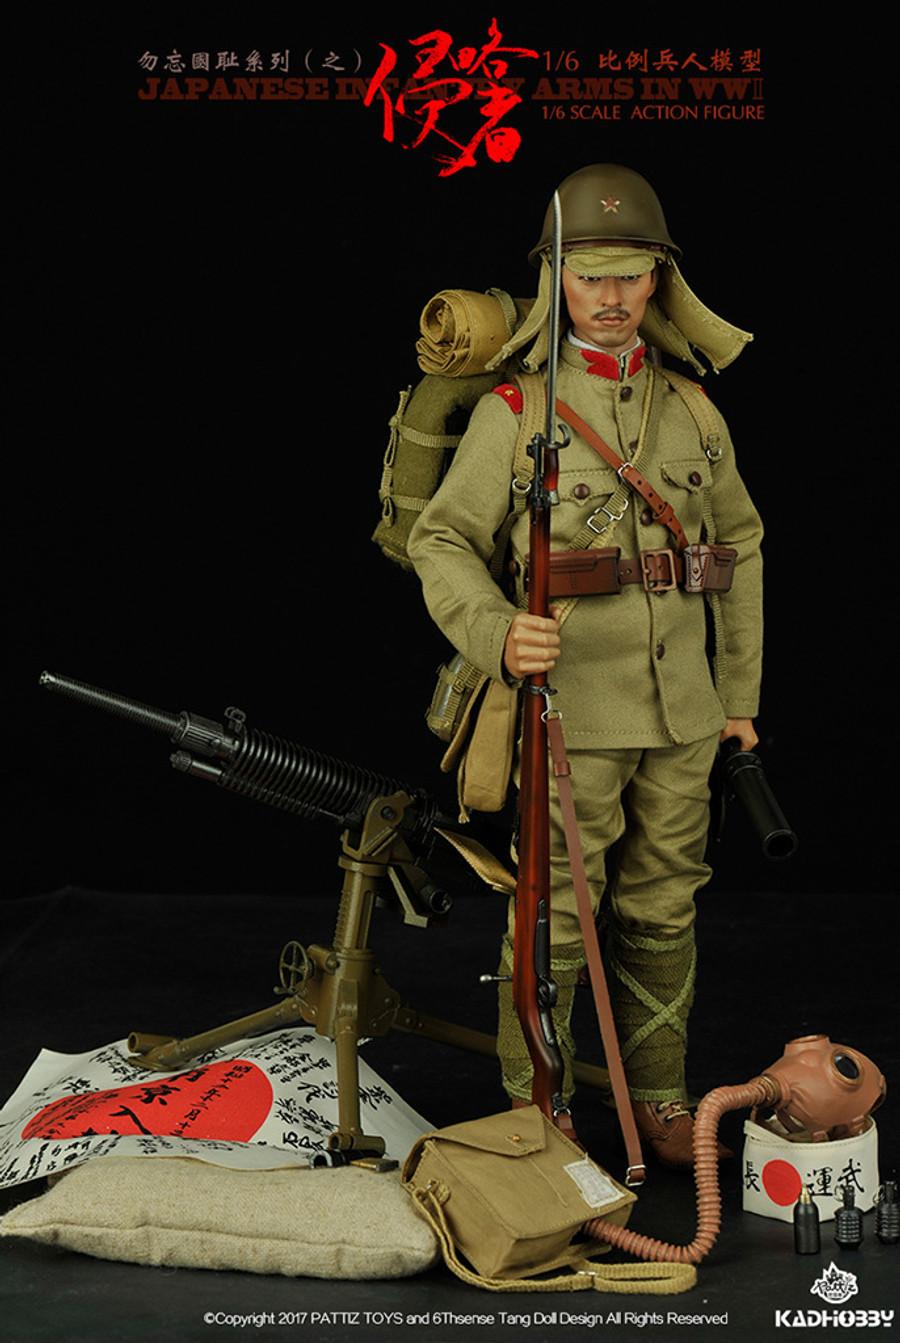 KADHOBBY - WWII Japanese Infantry Army